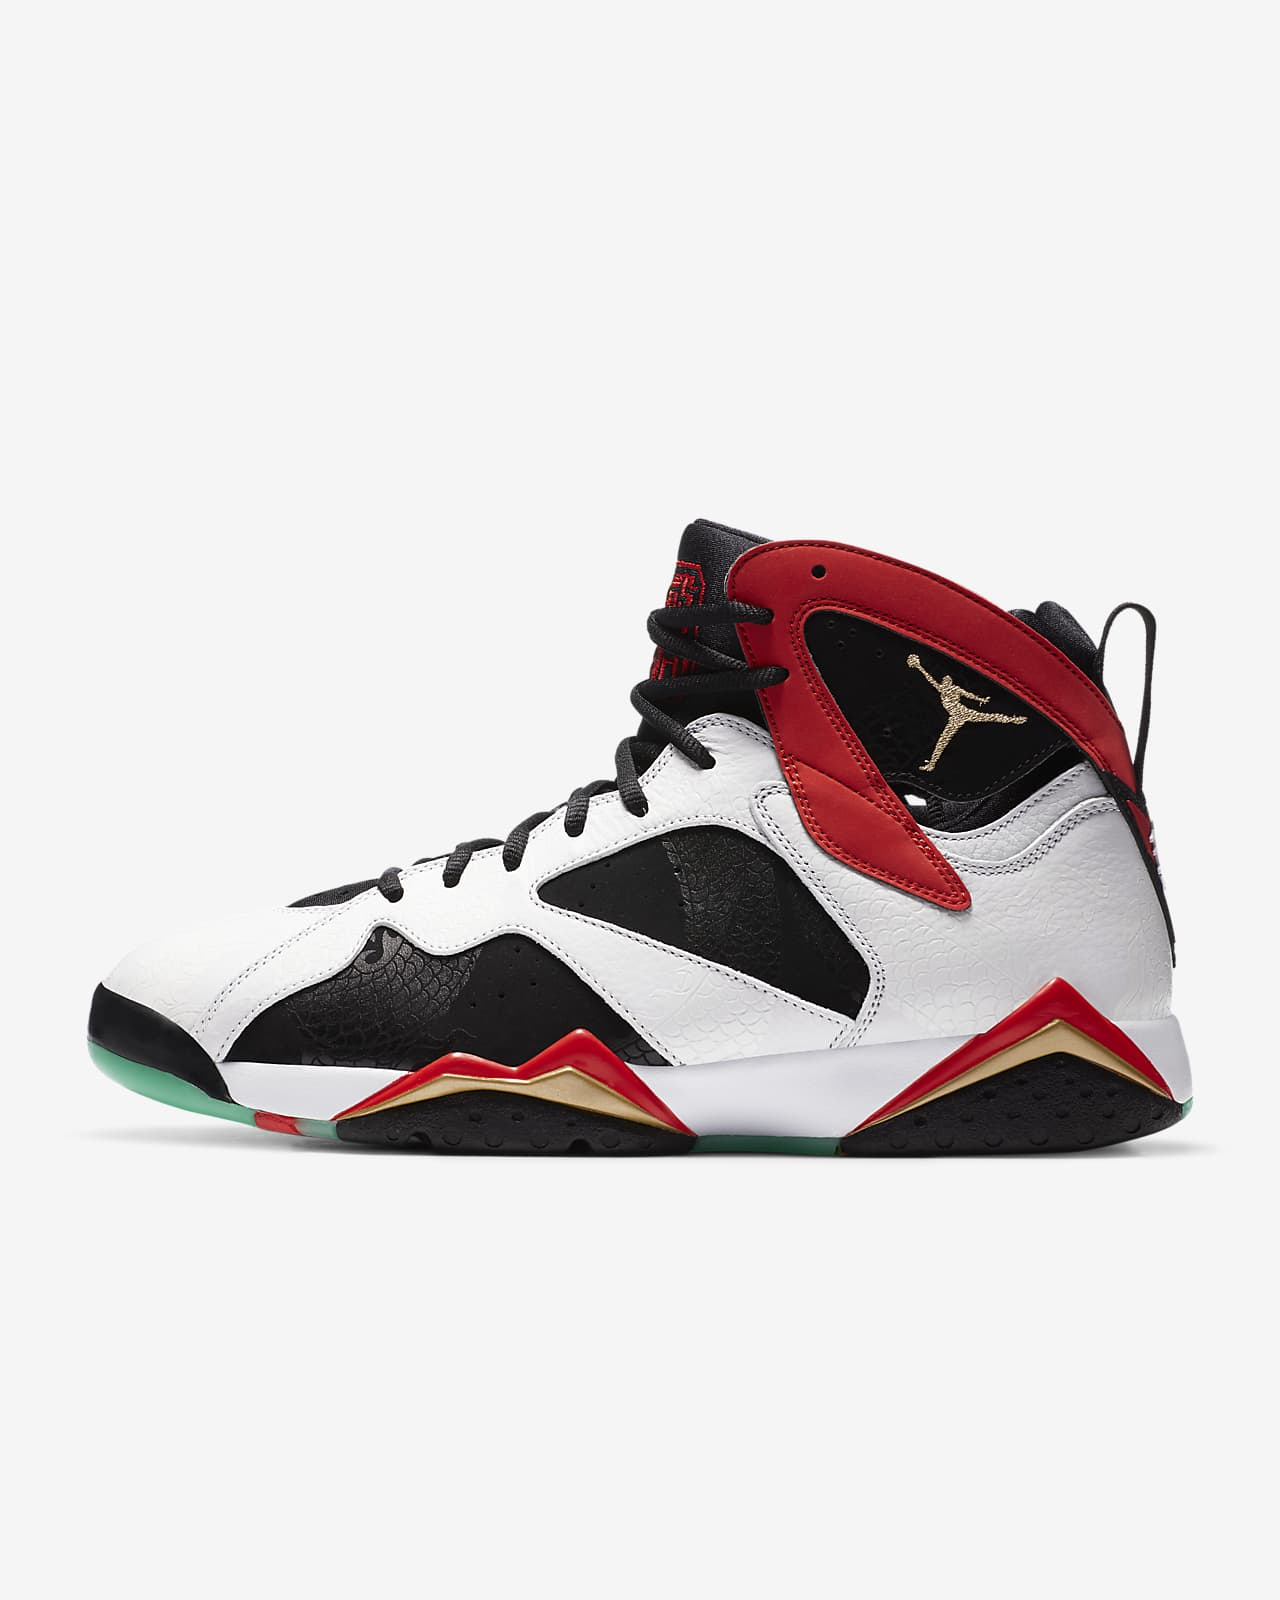 Acera pintar gloria  Air Jordan 7 Retro GC Men's Shoe. Nike GB